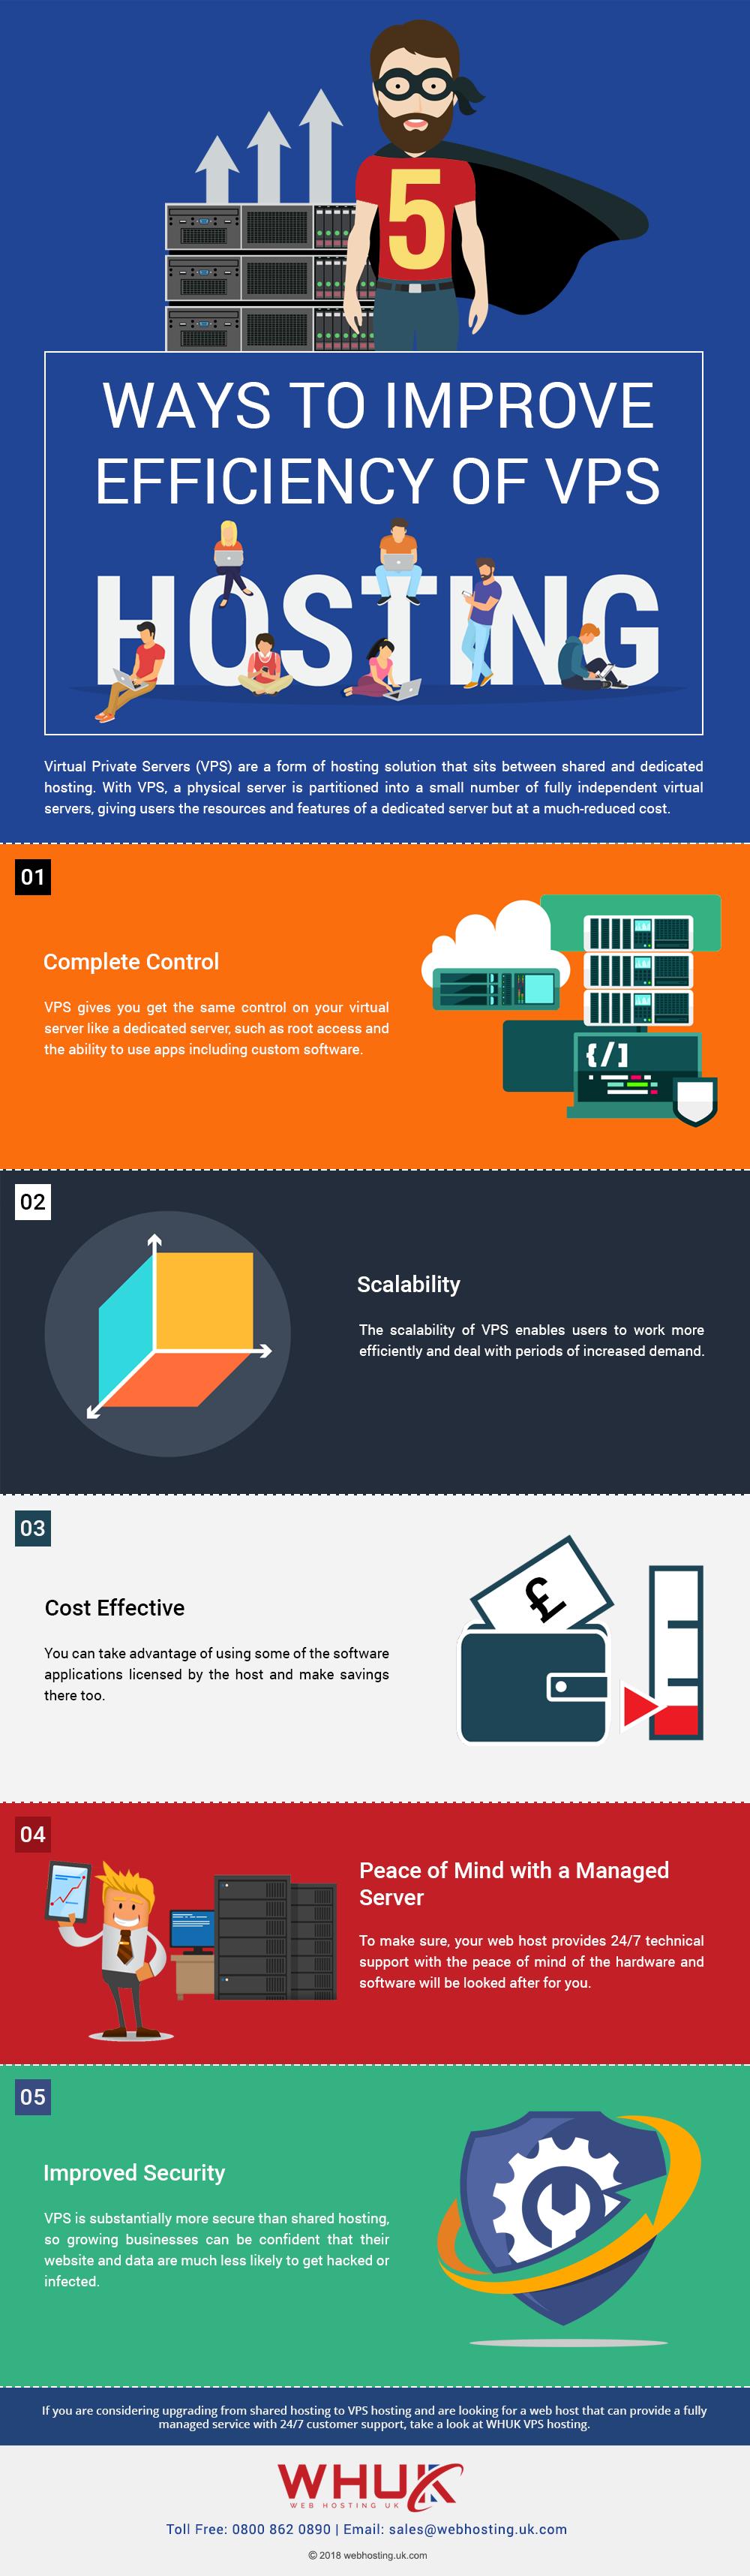 5 Ways to Improve Efficiency of VPS Hosting